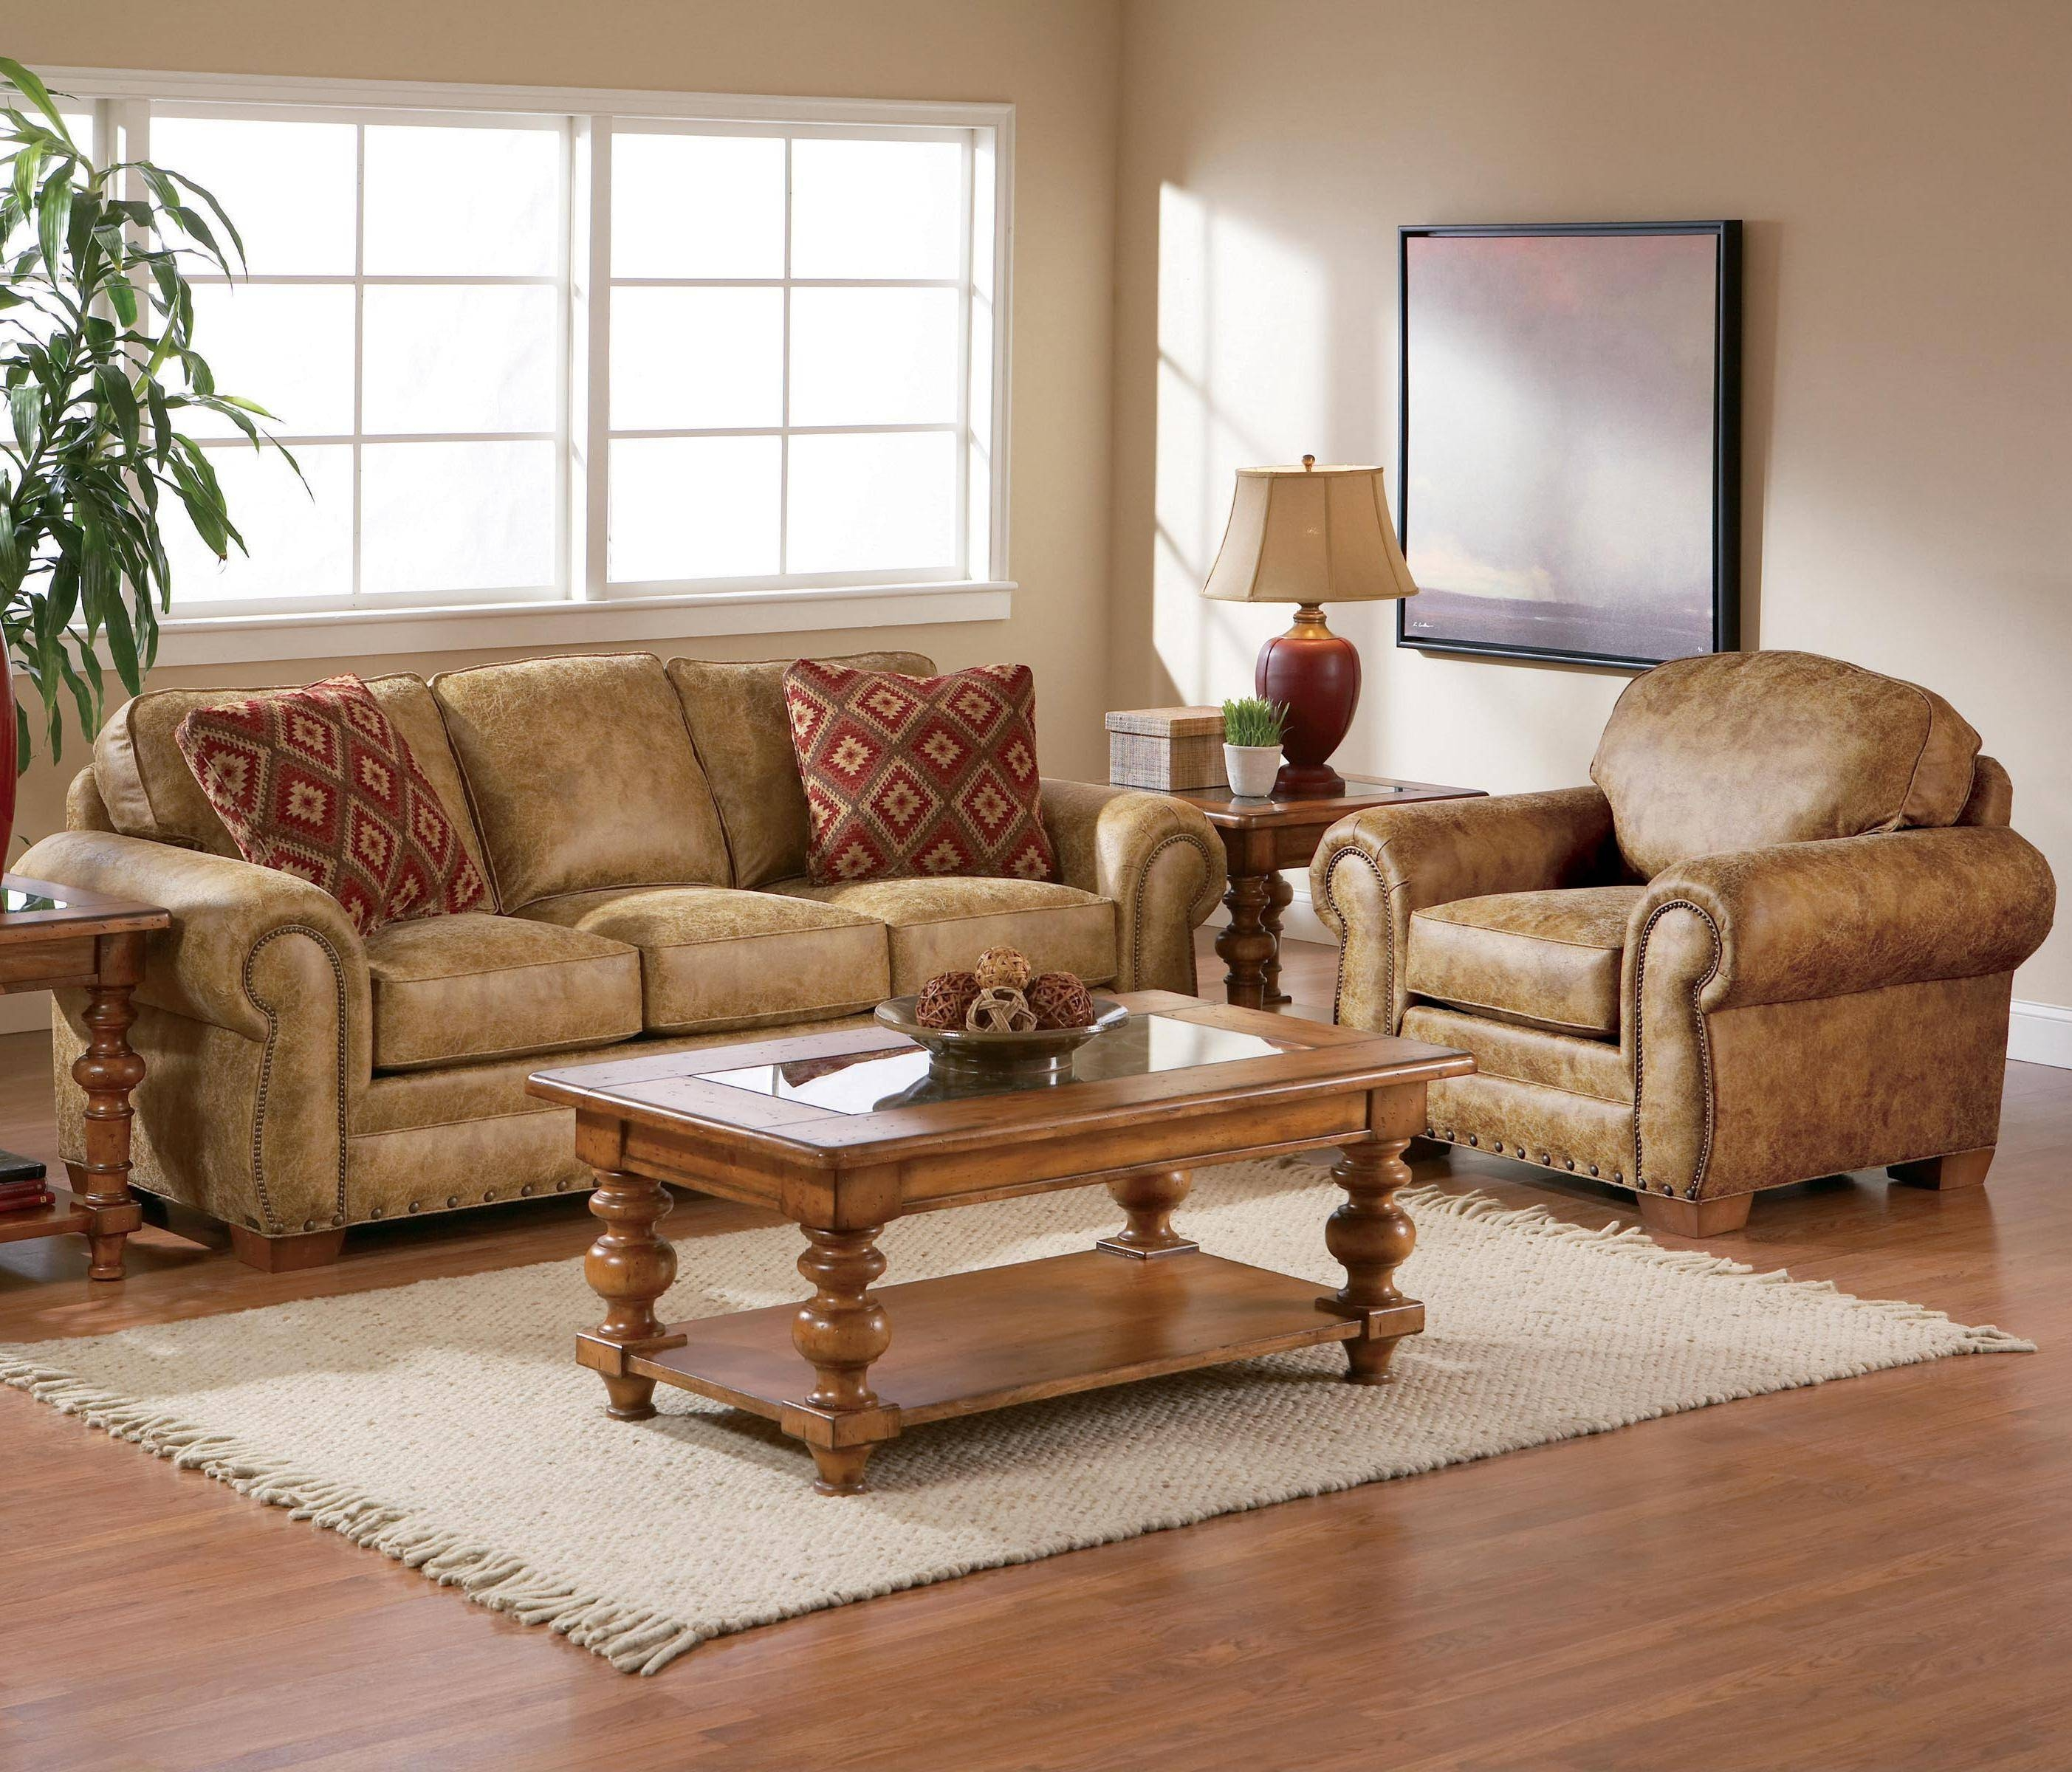 Furniture: Stunning Broyhill Sofas For Enchanting Living Room regarding Broyhill Reclining Sofas (Image 13 of 15)